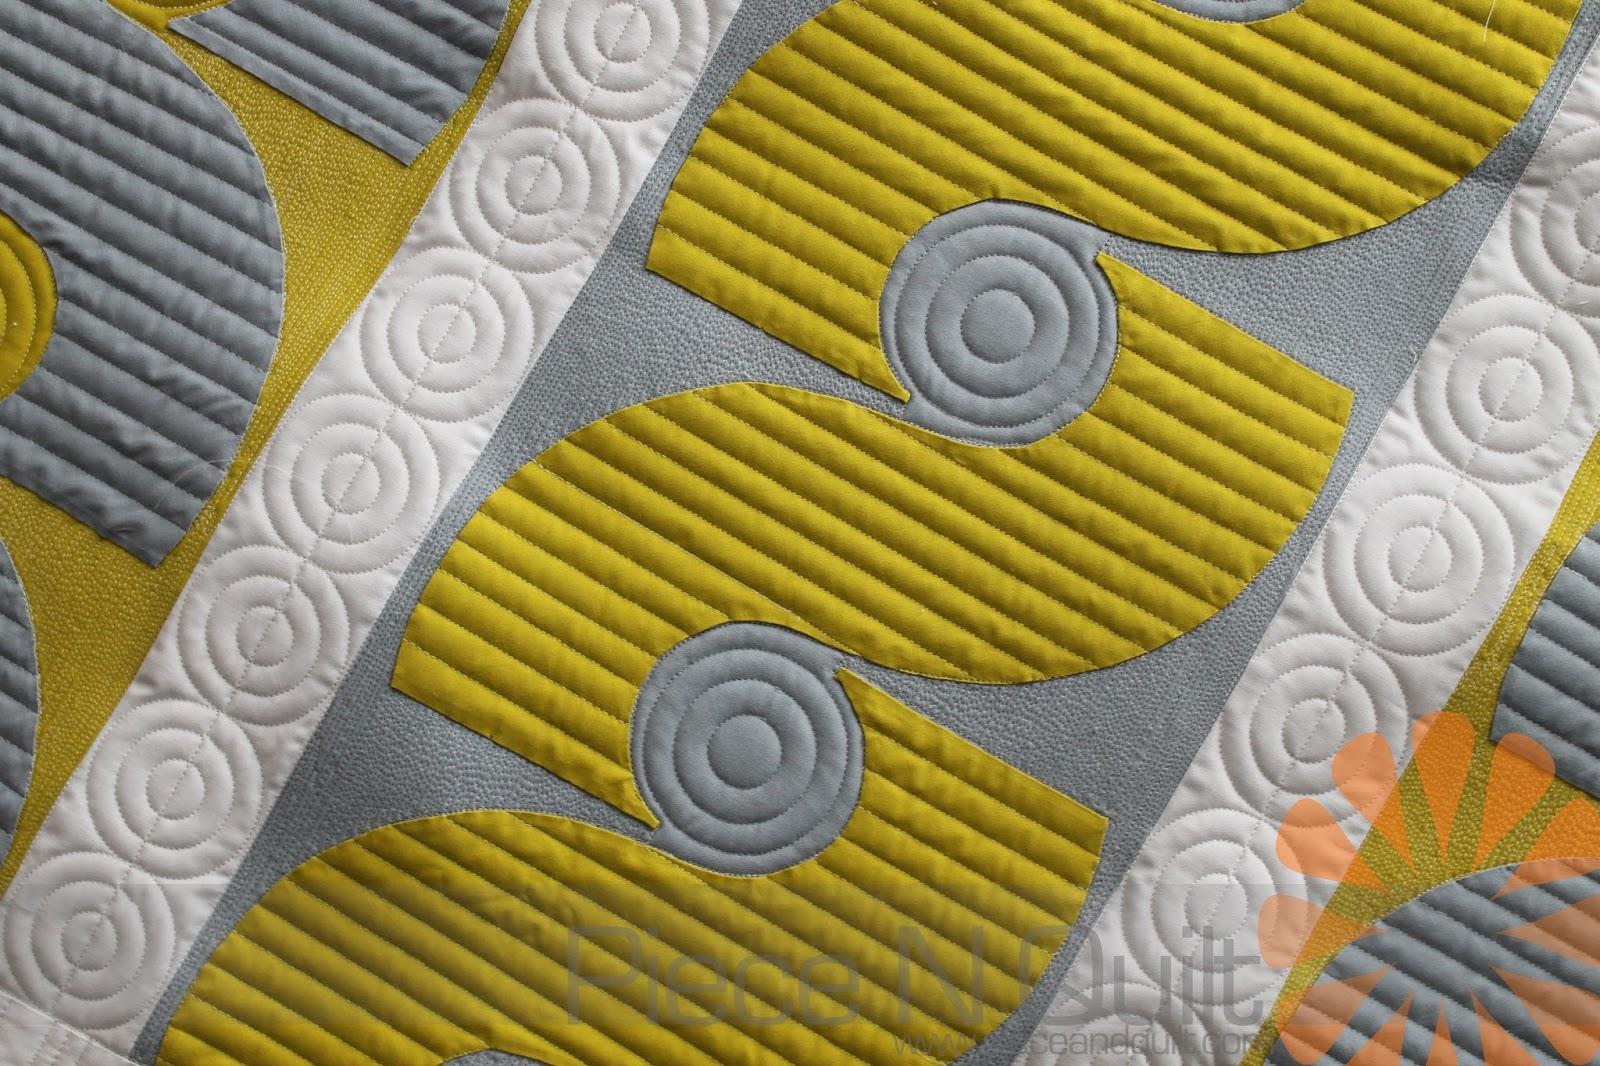 Piece N Quilt Custom Machine Quilting A Modern Quilt By